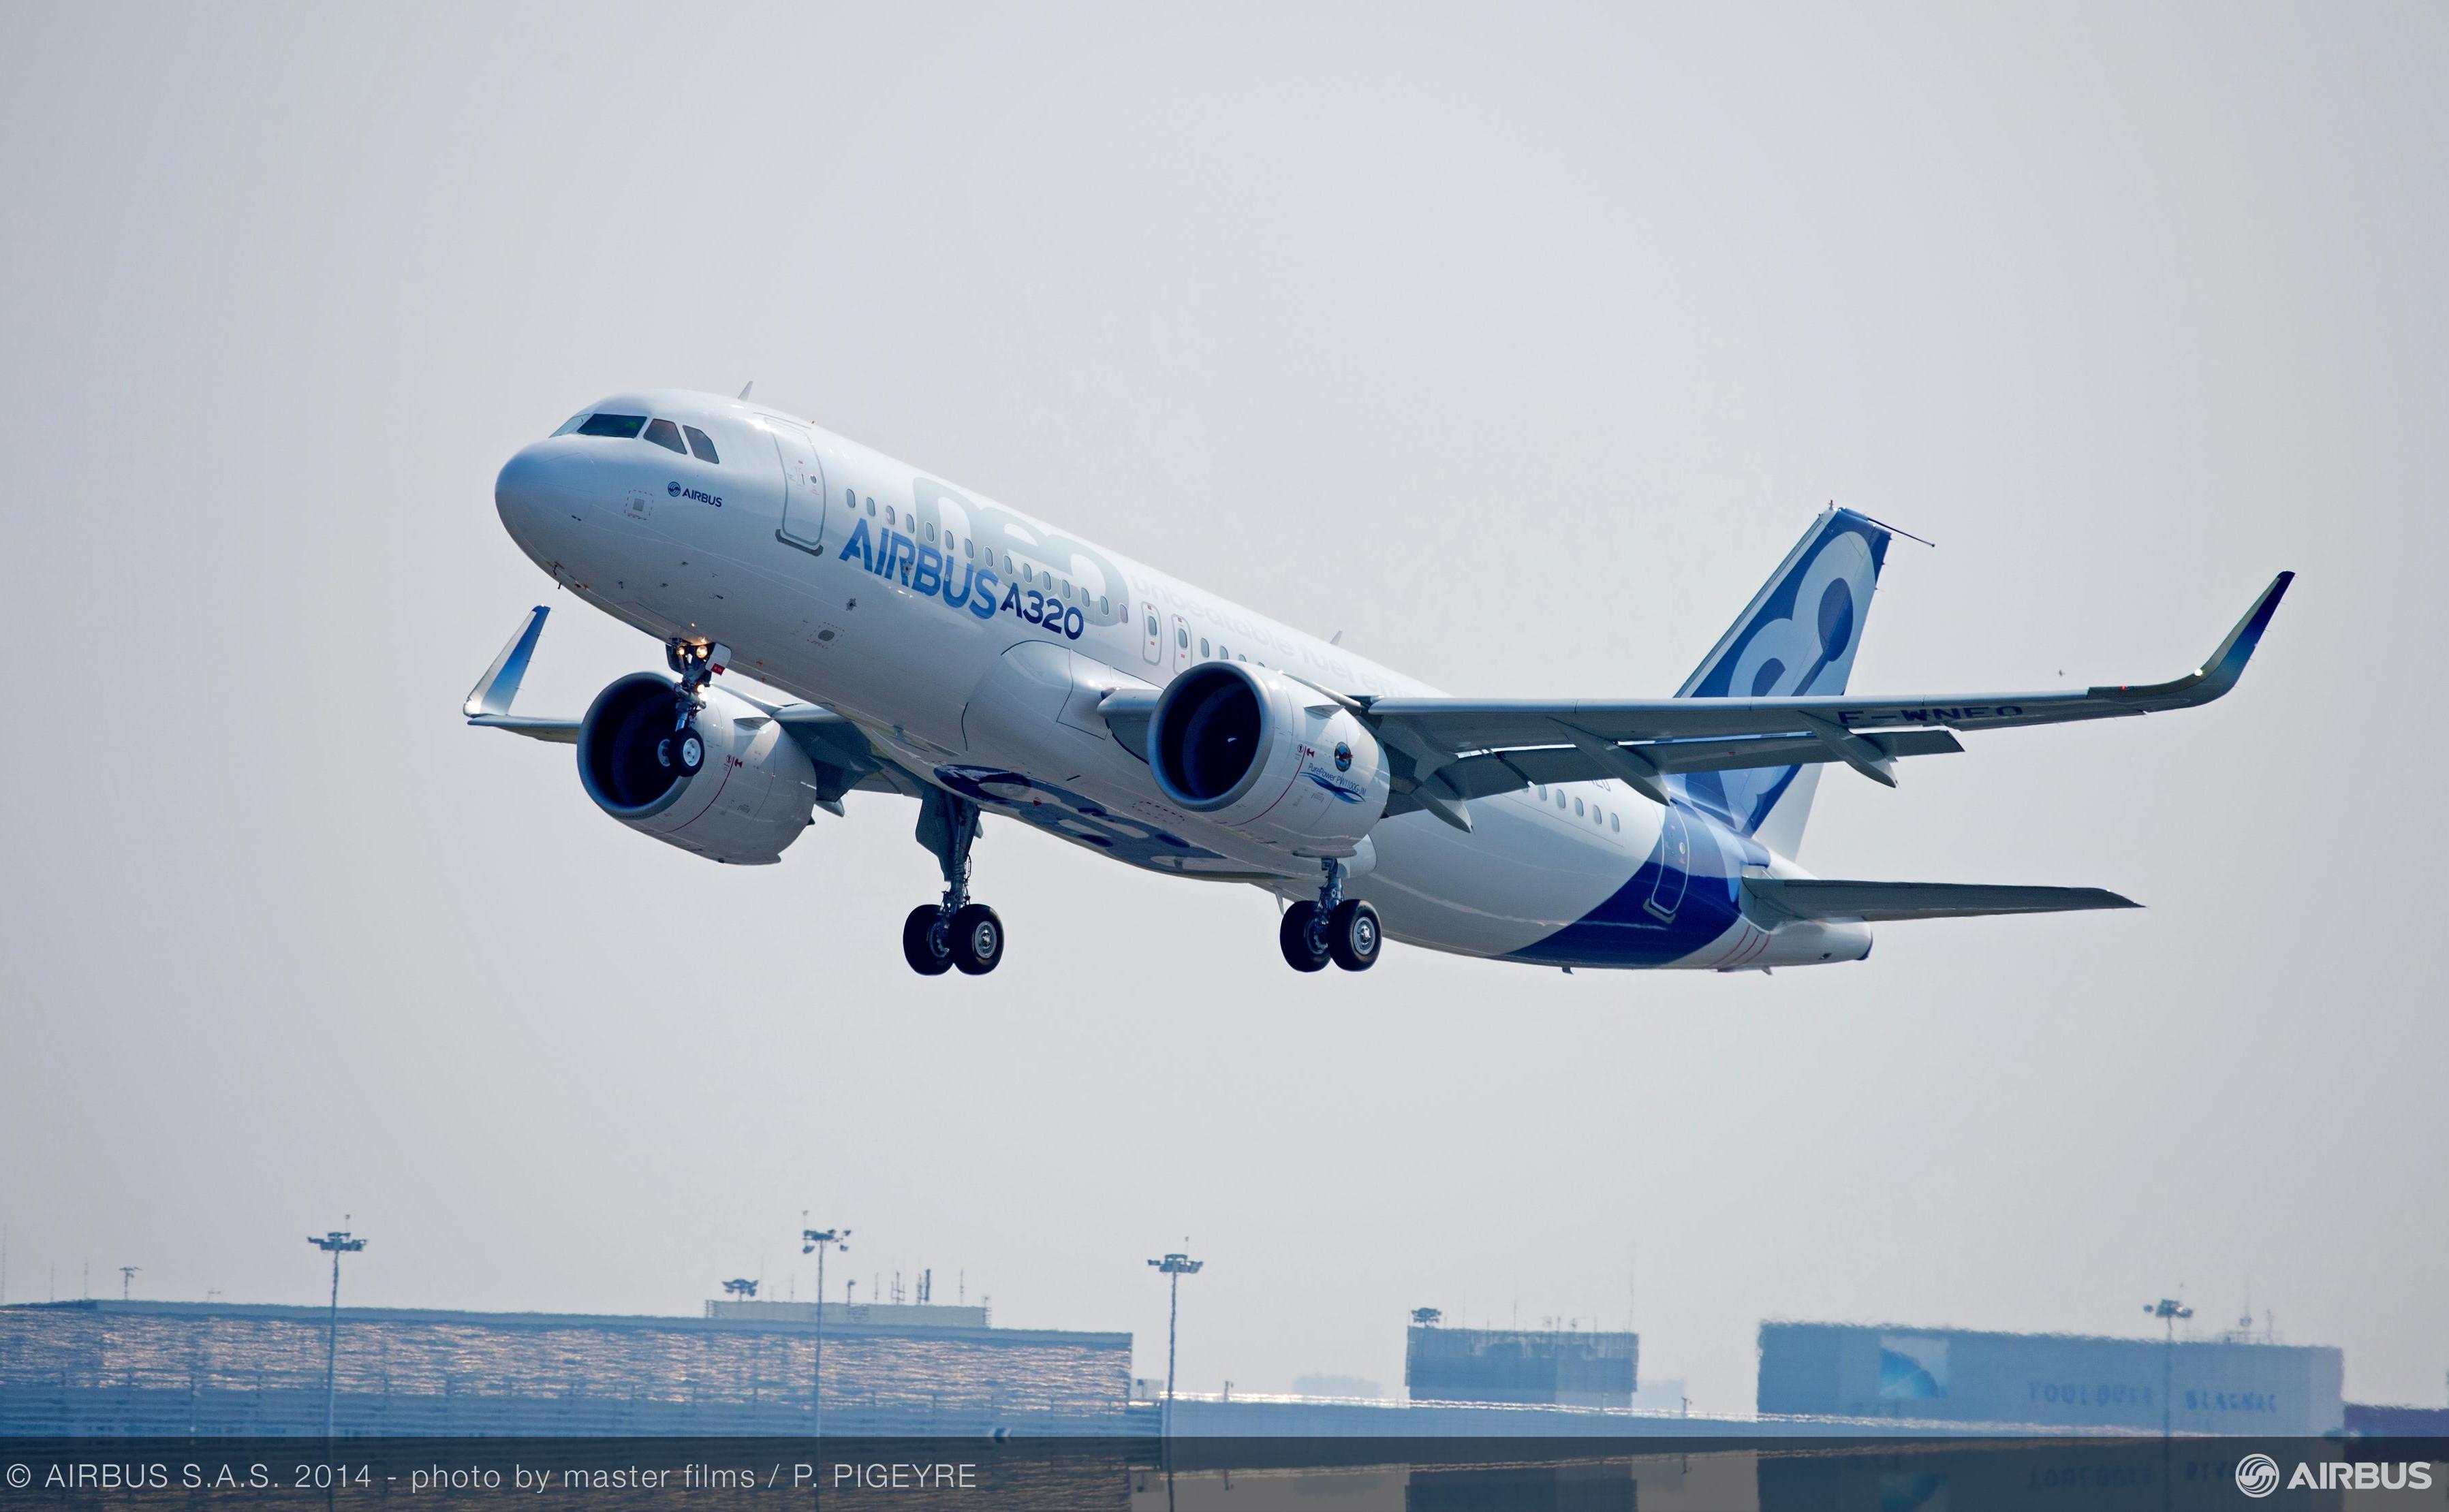 A320neobig